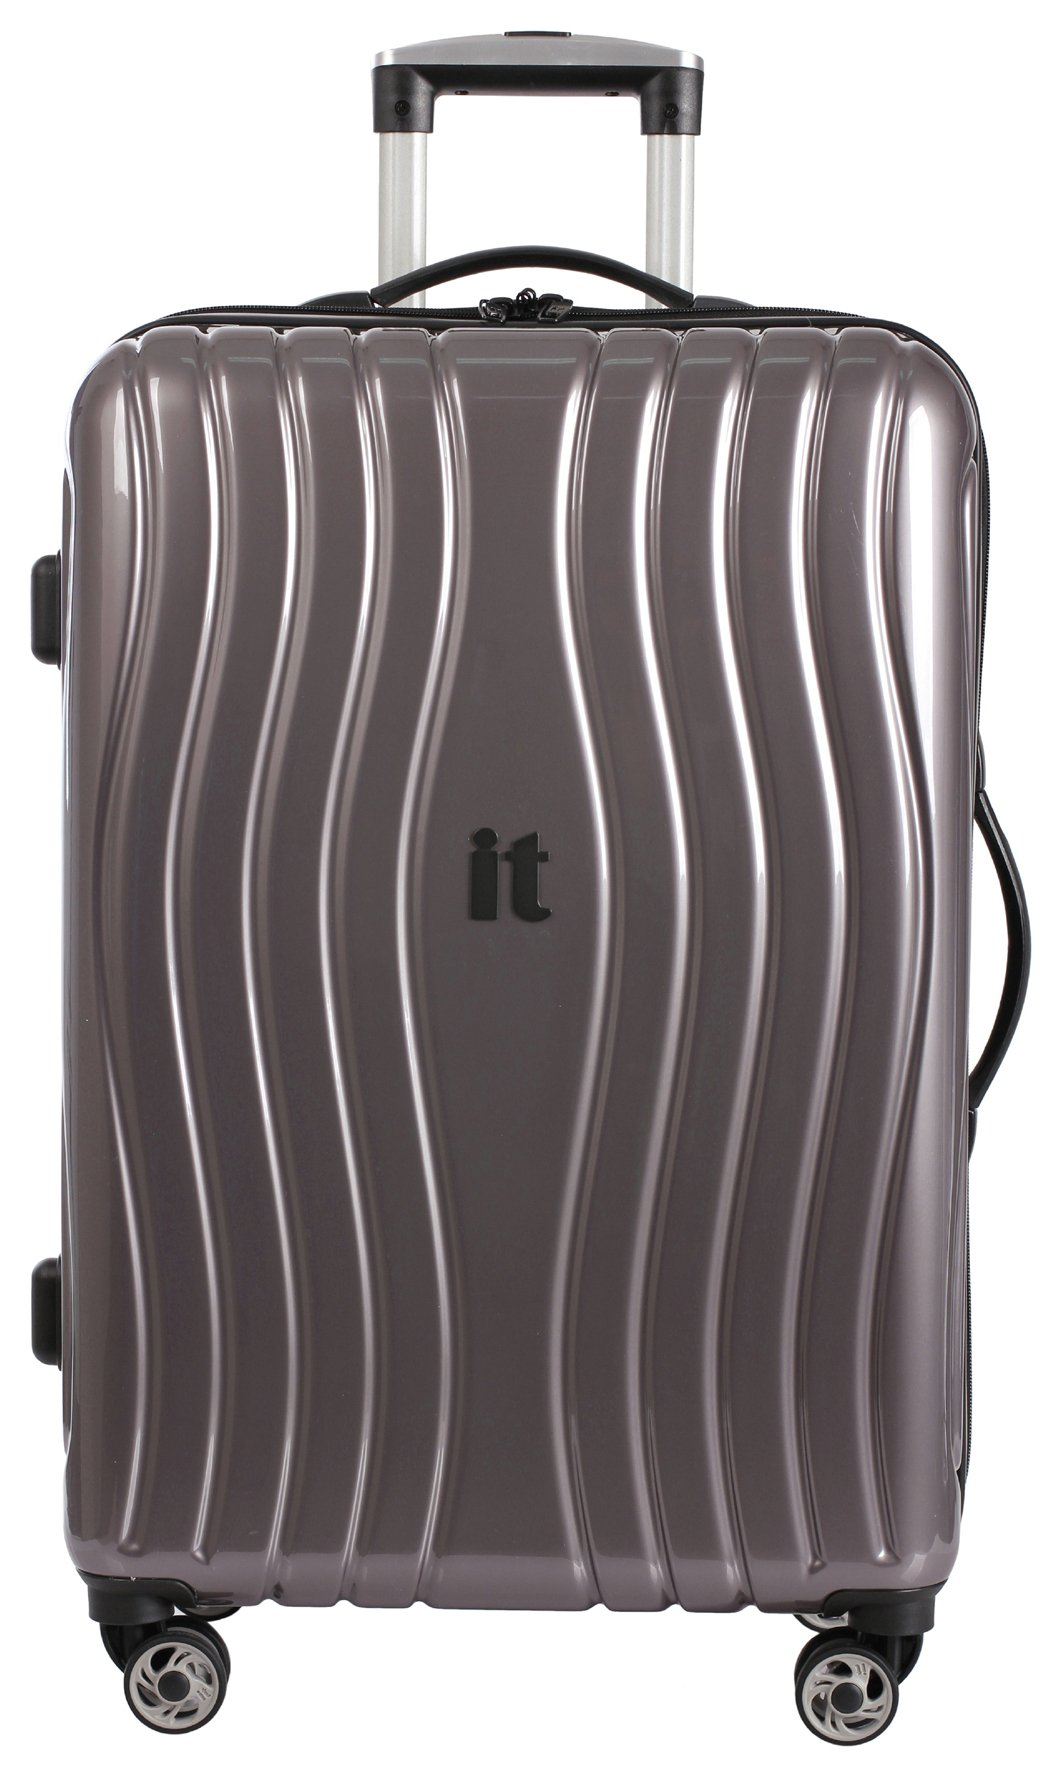 it-luggage-hard-8-wheel-medium-suitcase-metallic